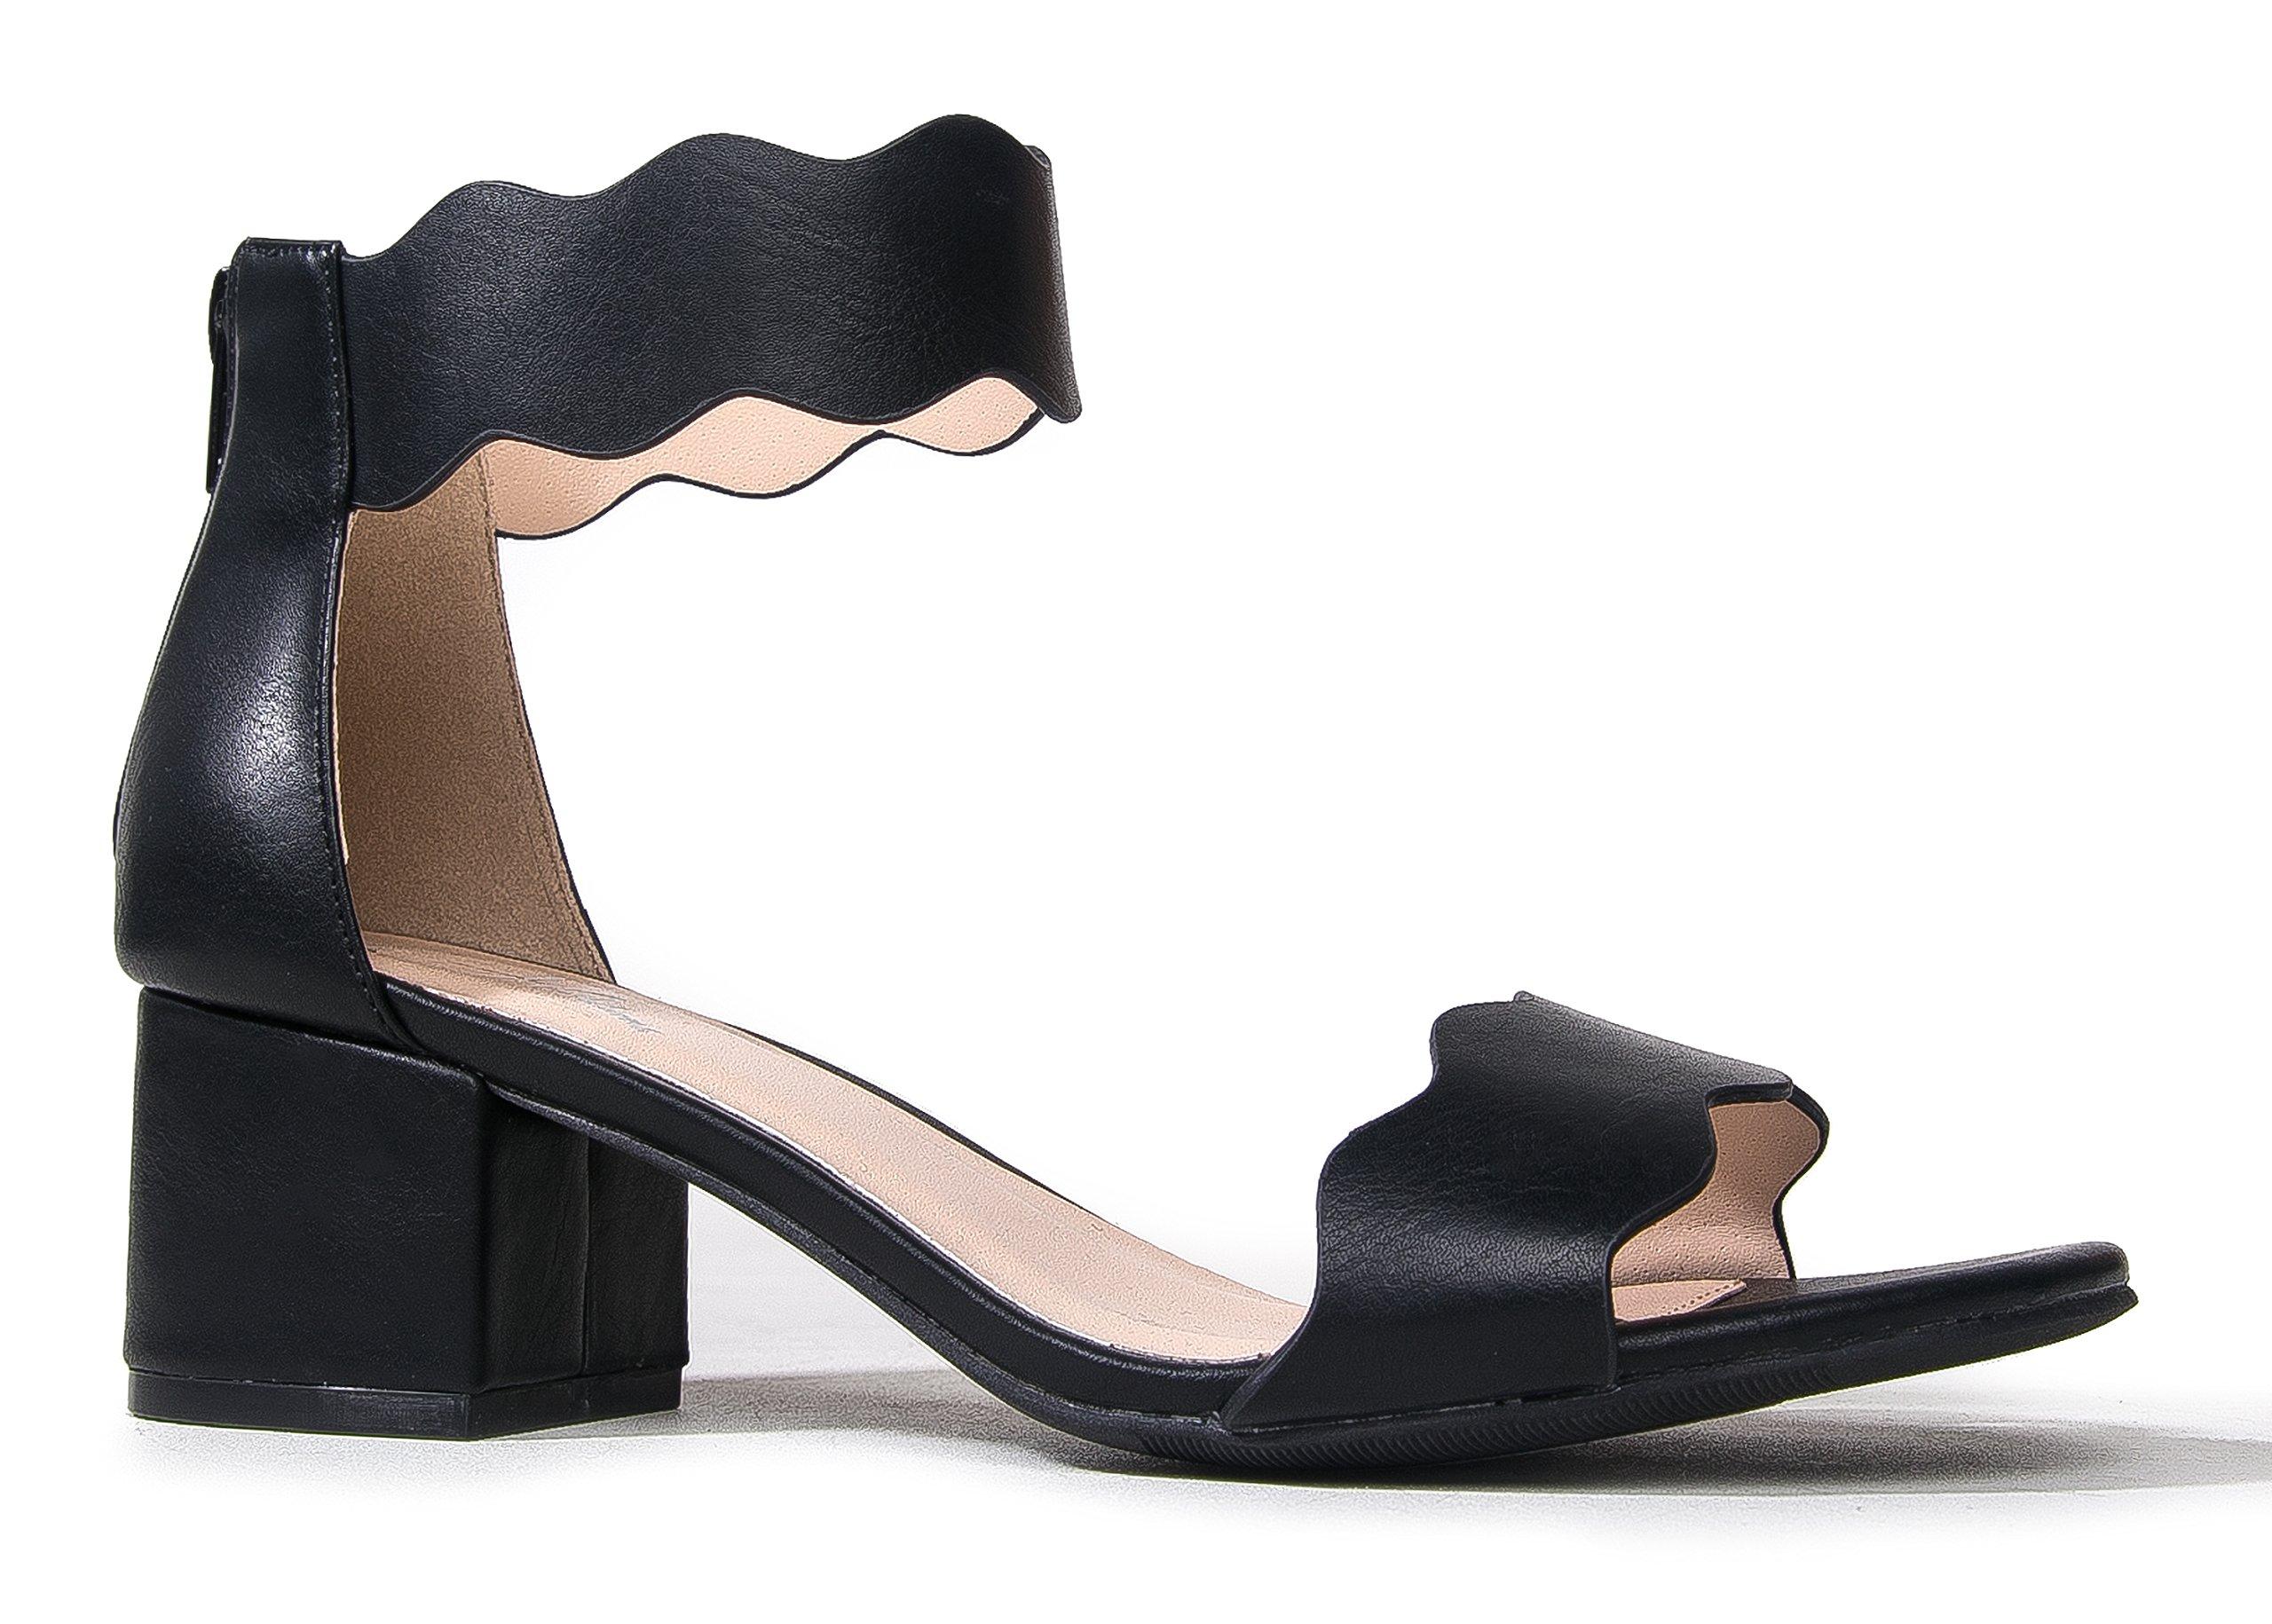 J. Adams Open Toe Ankle Strap Sandal, Black PU, 11 B(M) US